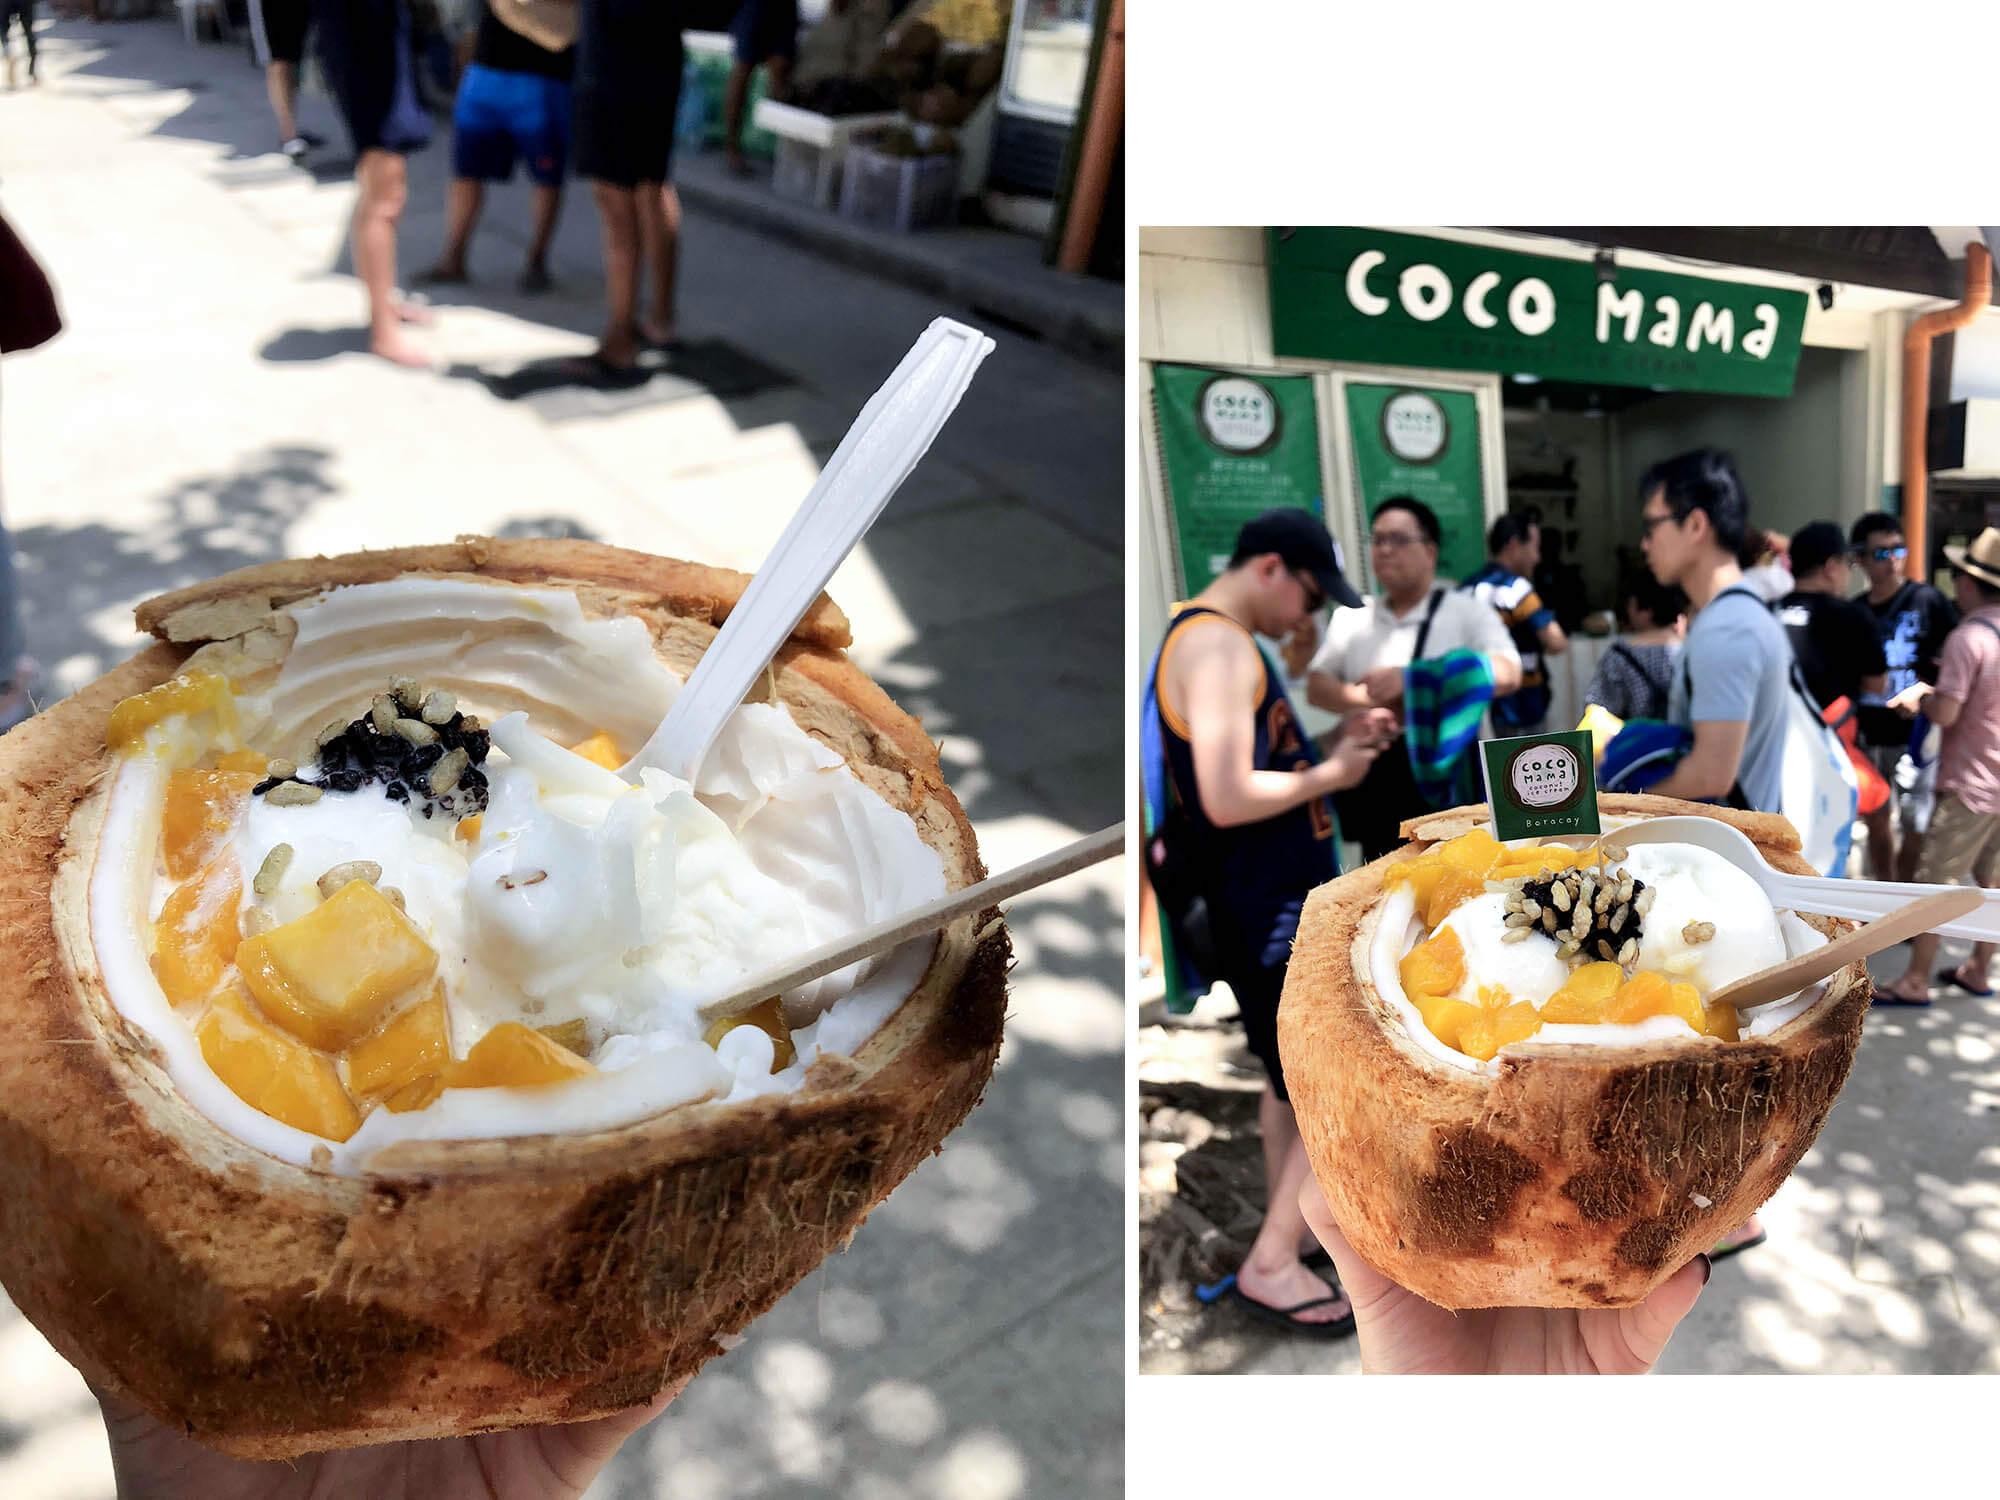 cocomama椰子冰淇淋含果肉